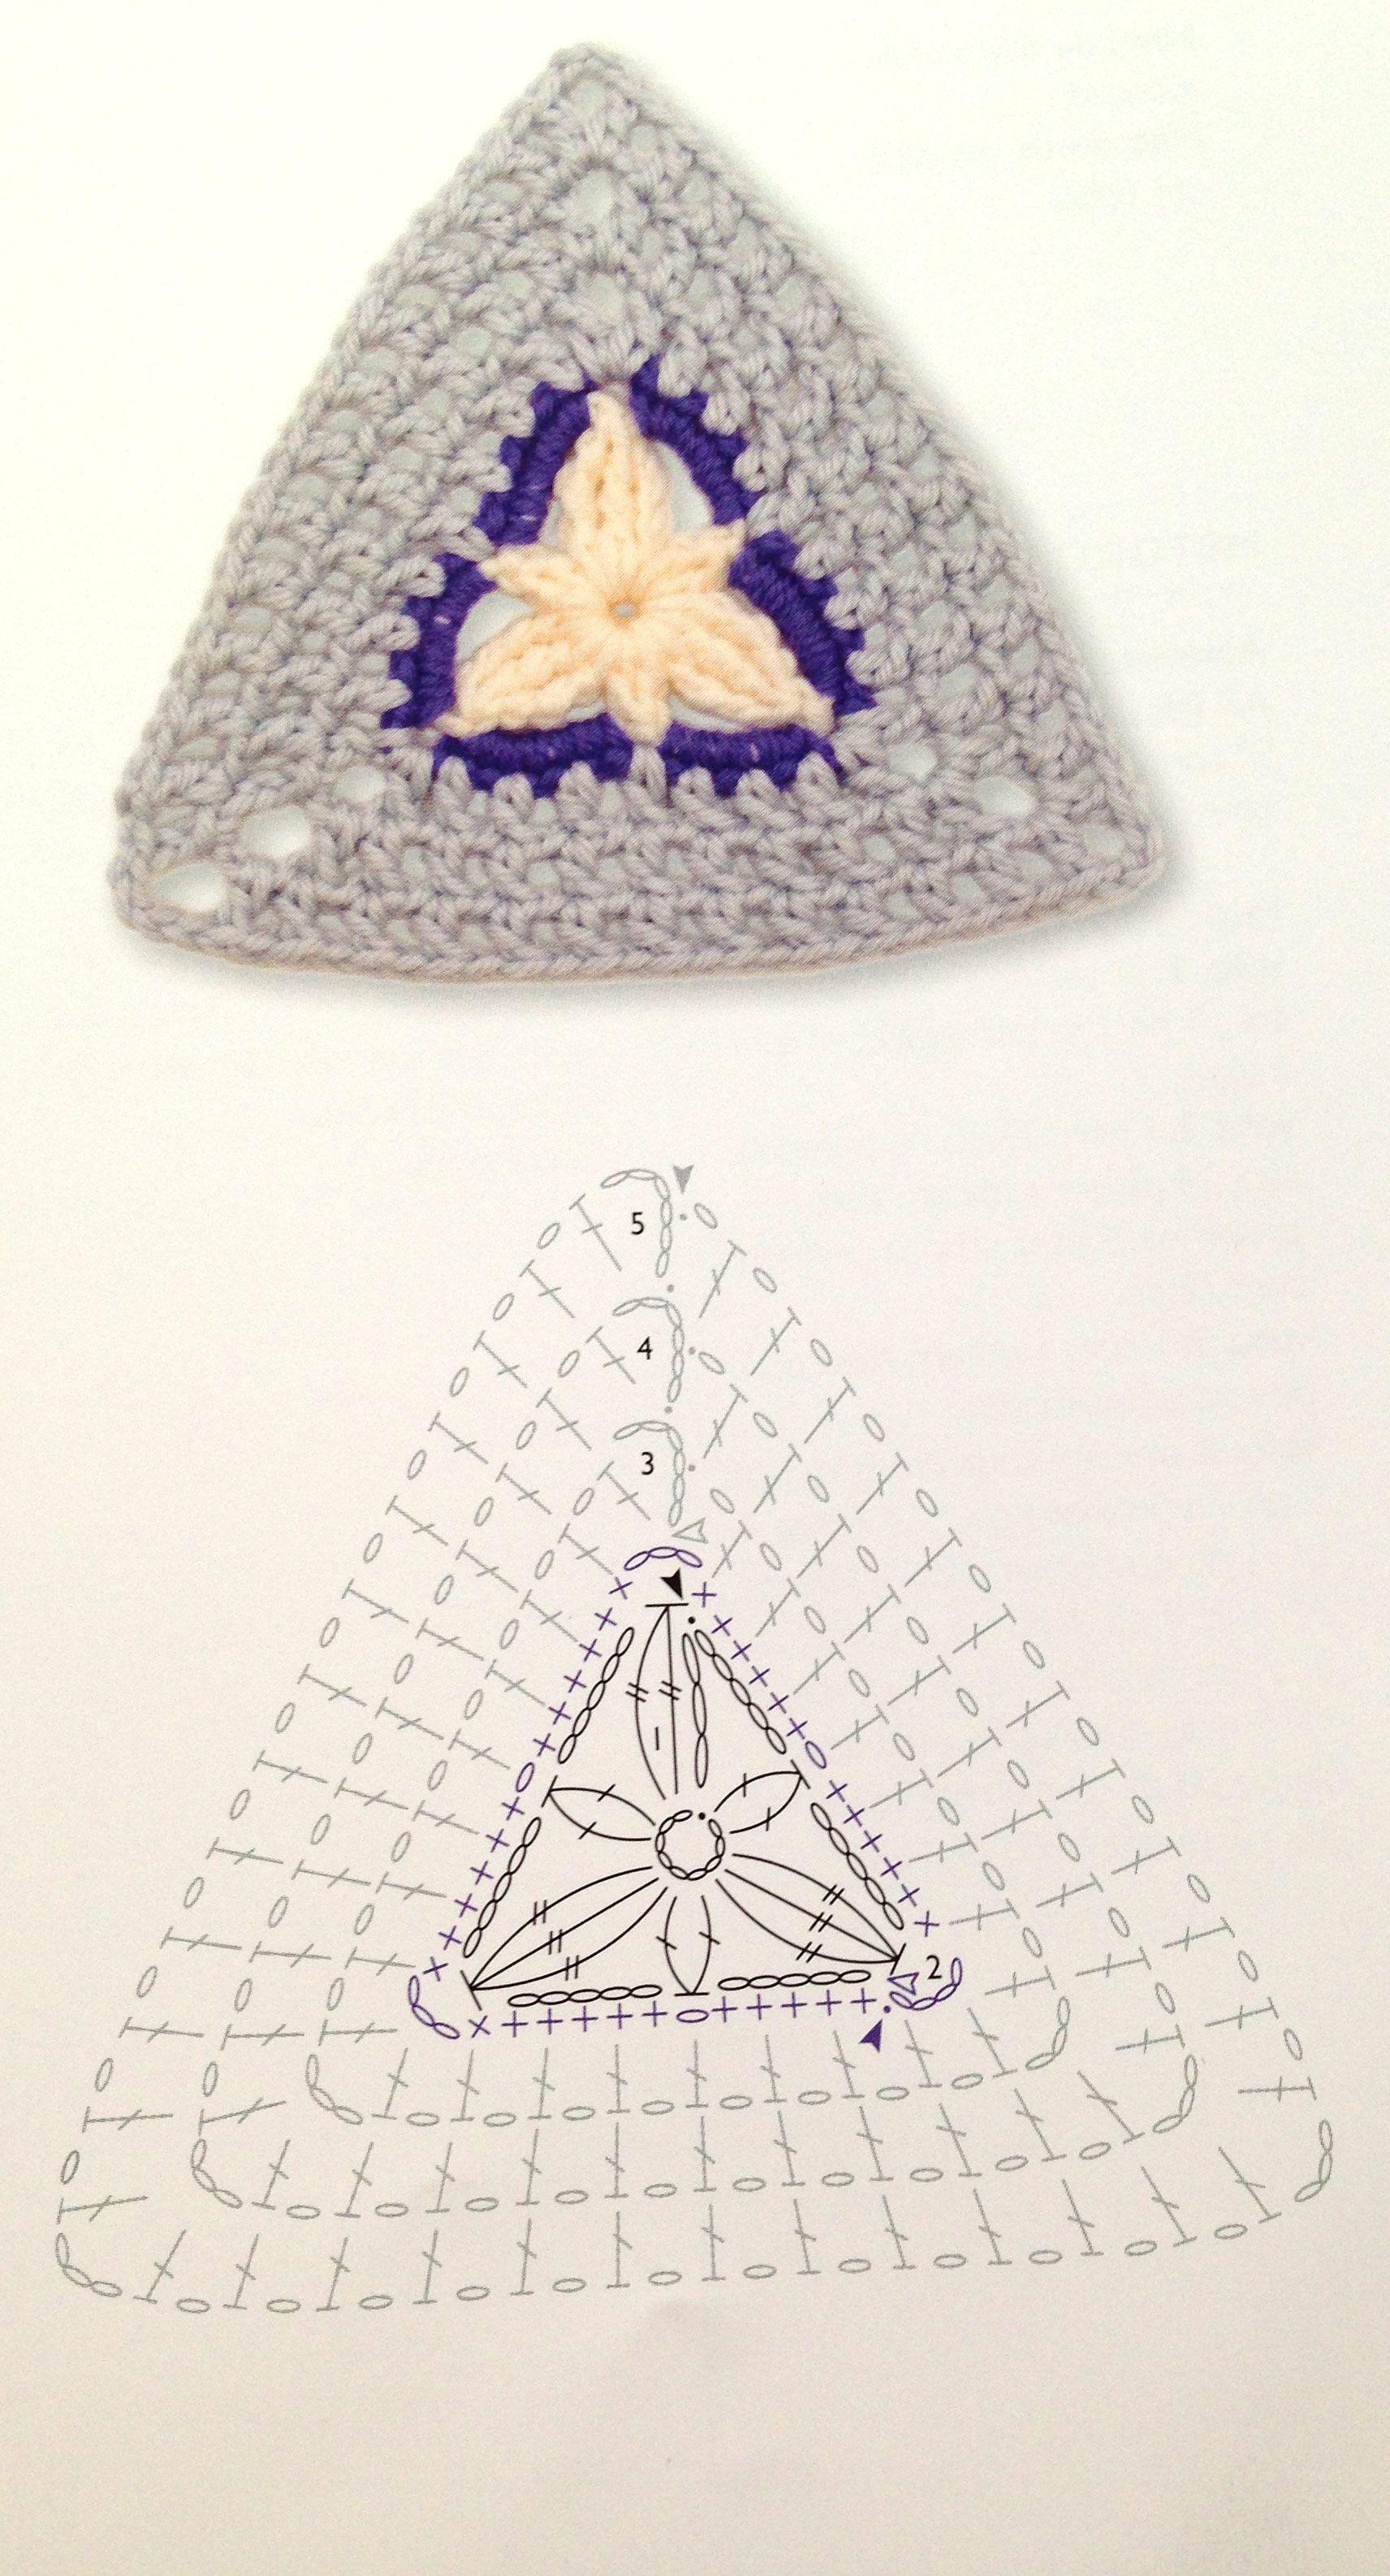 crochet granny square diagram 1995 dodge ram 2500 wiring triangle flower pattern pinterest